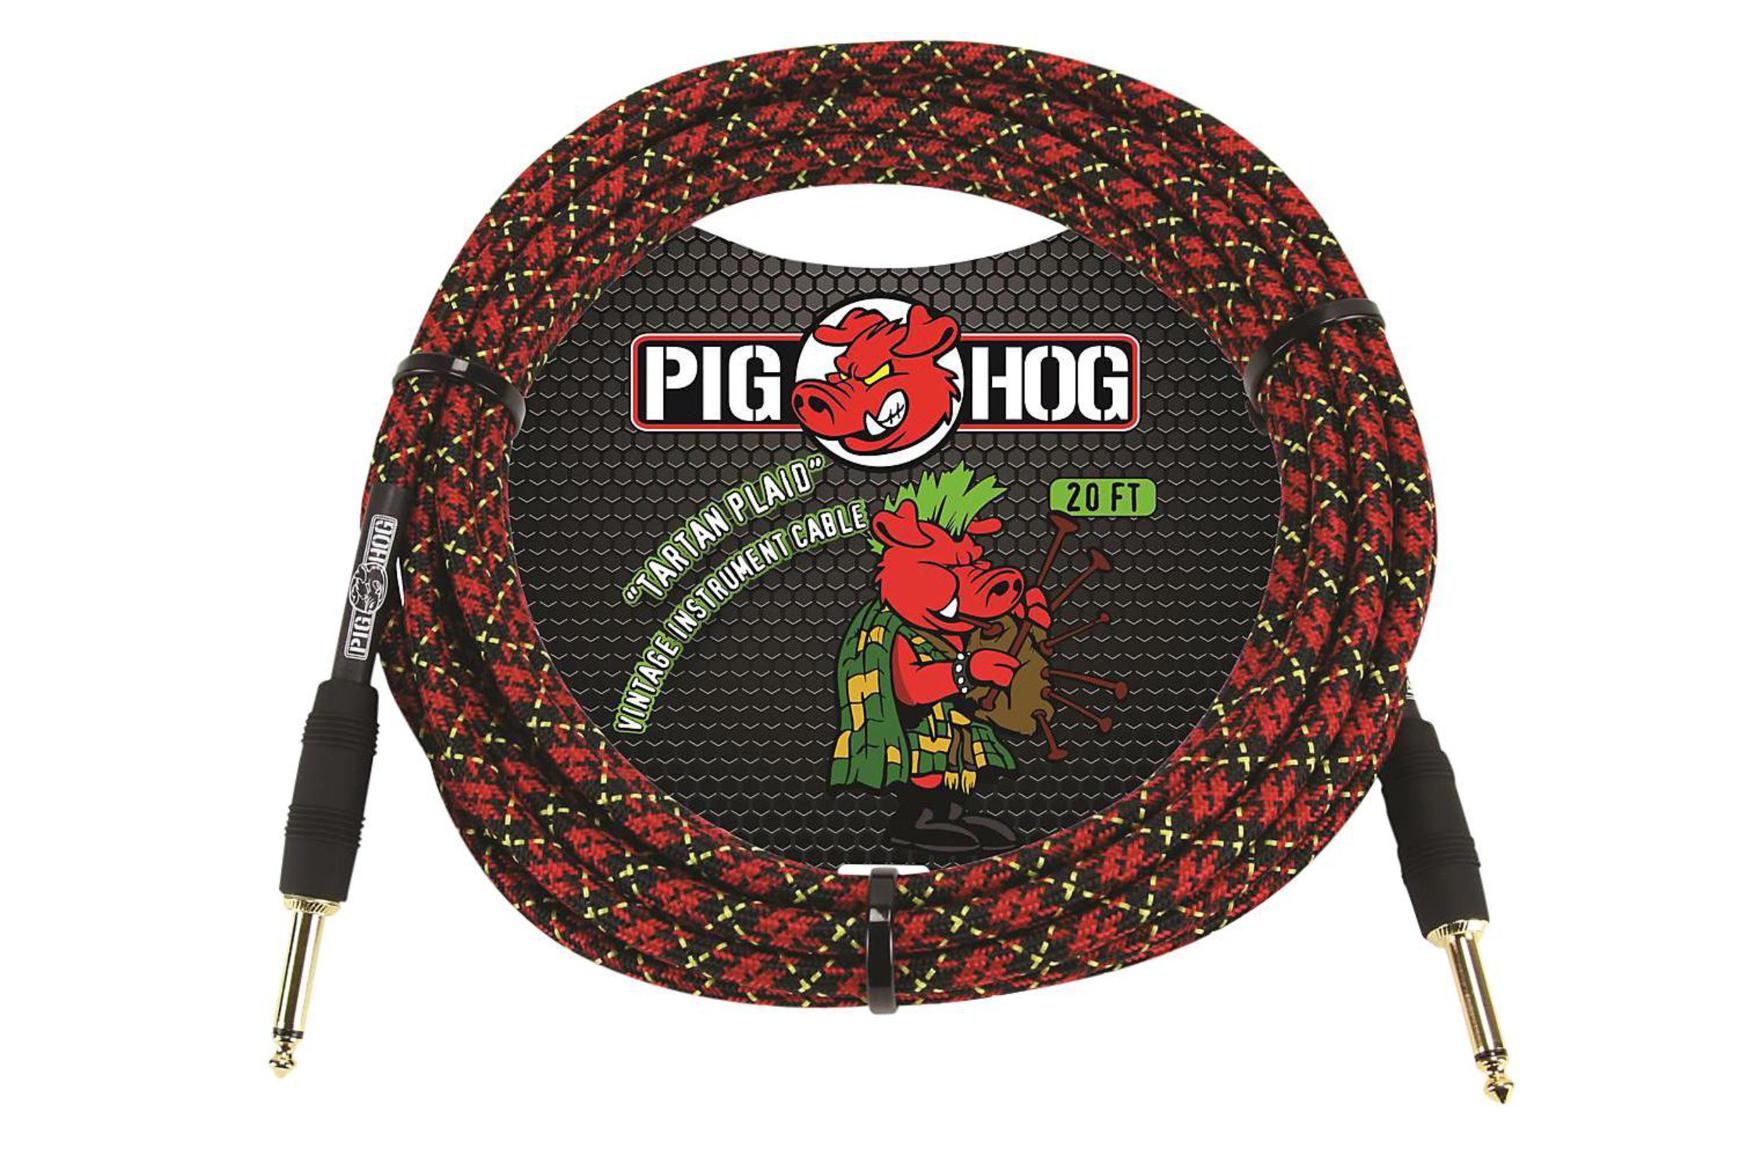 Pig Hog 20ft Tartan Plaid Instrument Cable